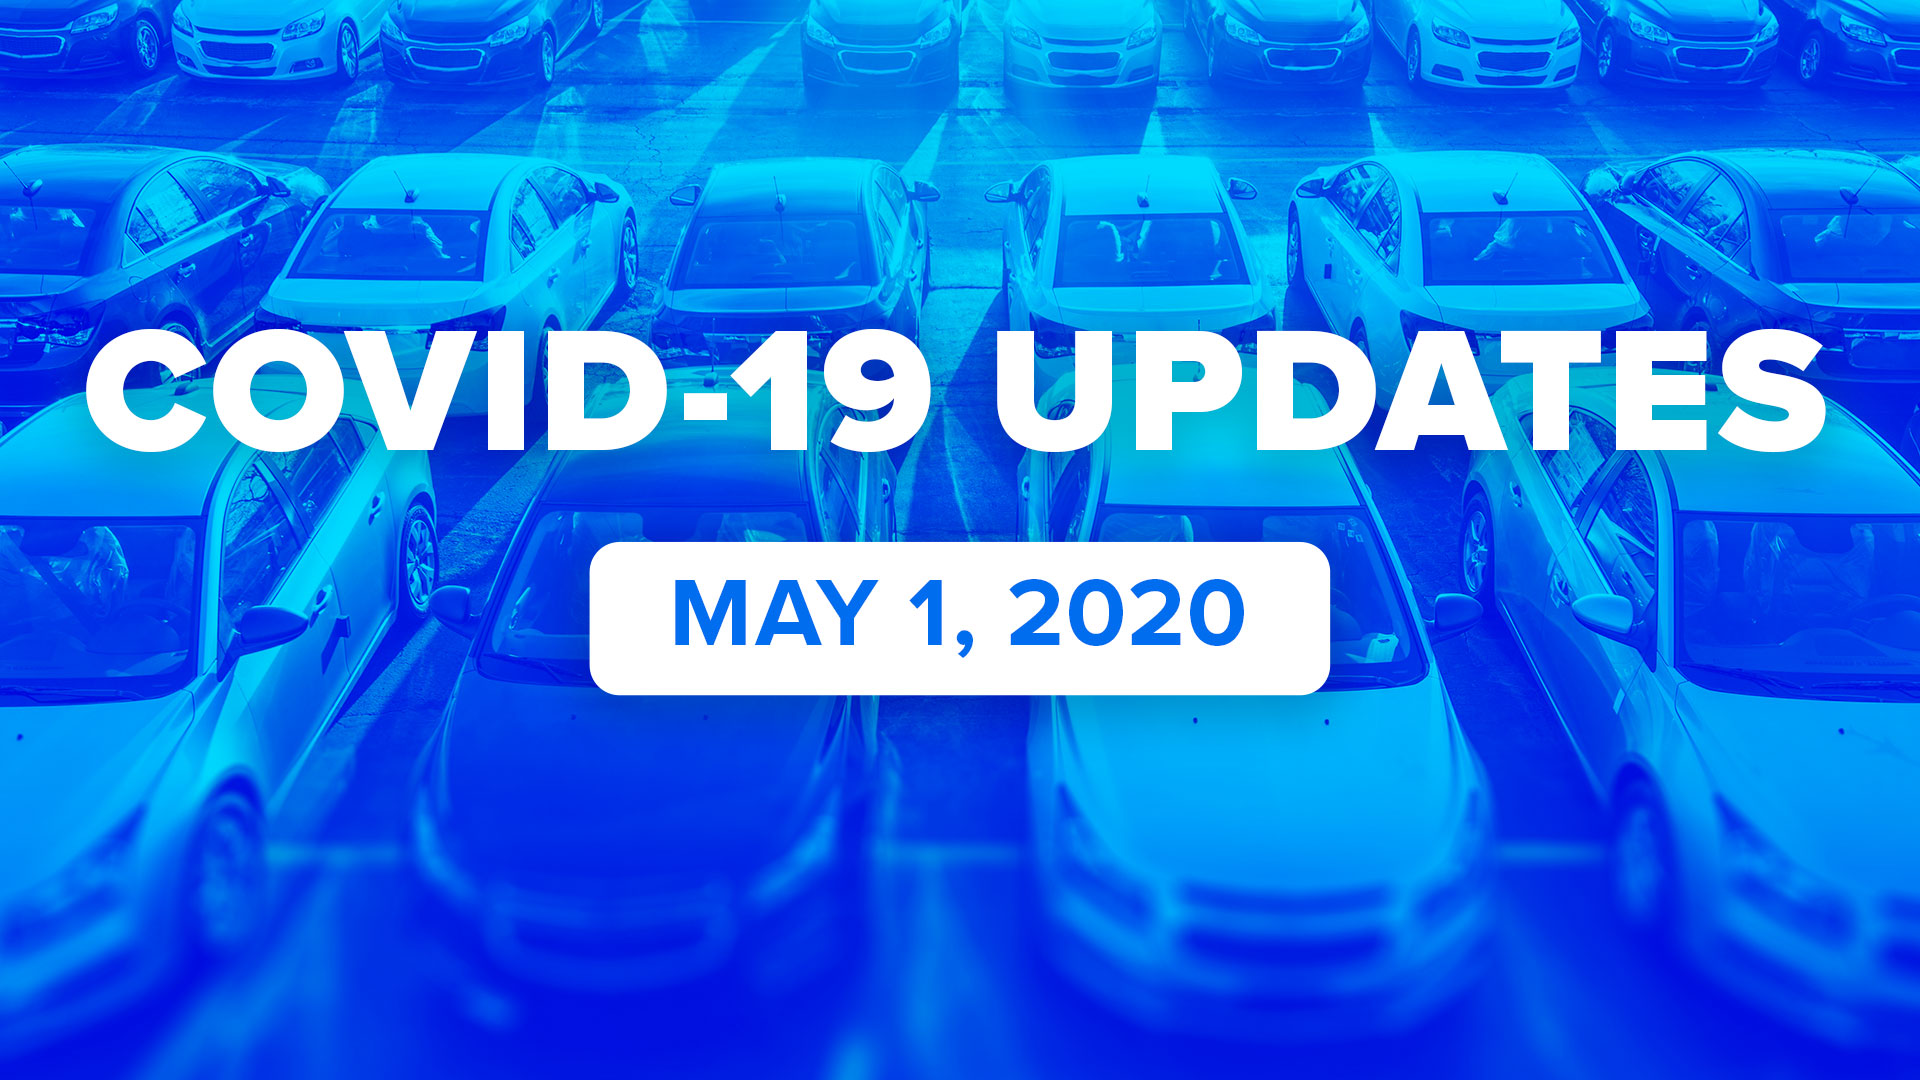 COVID-19 Updates: May 1, 2020